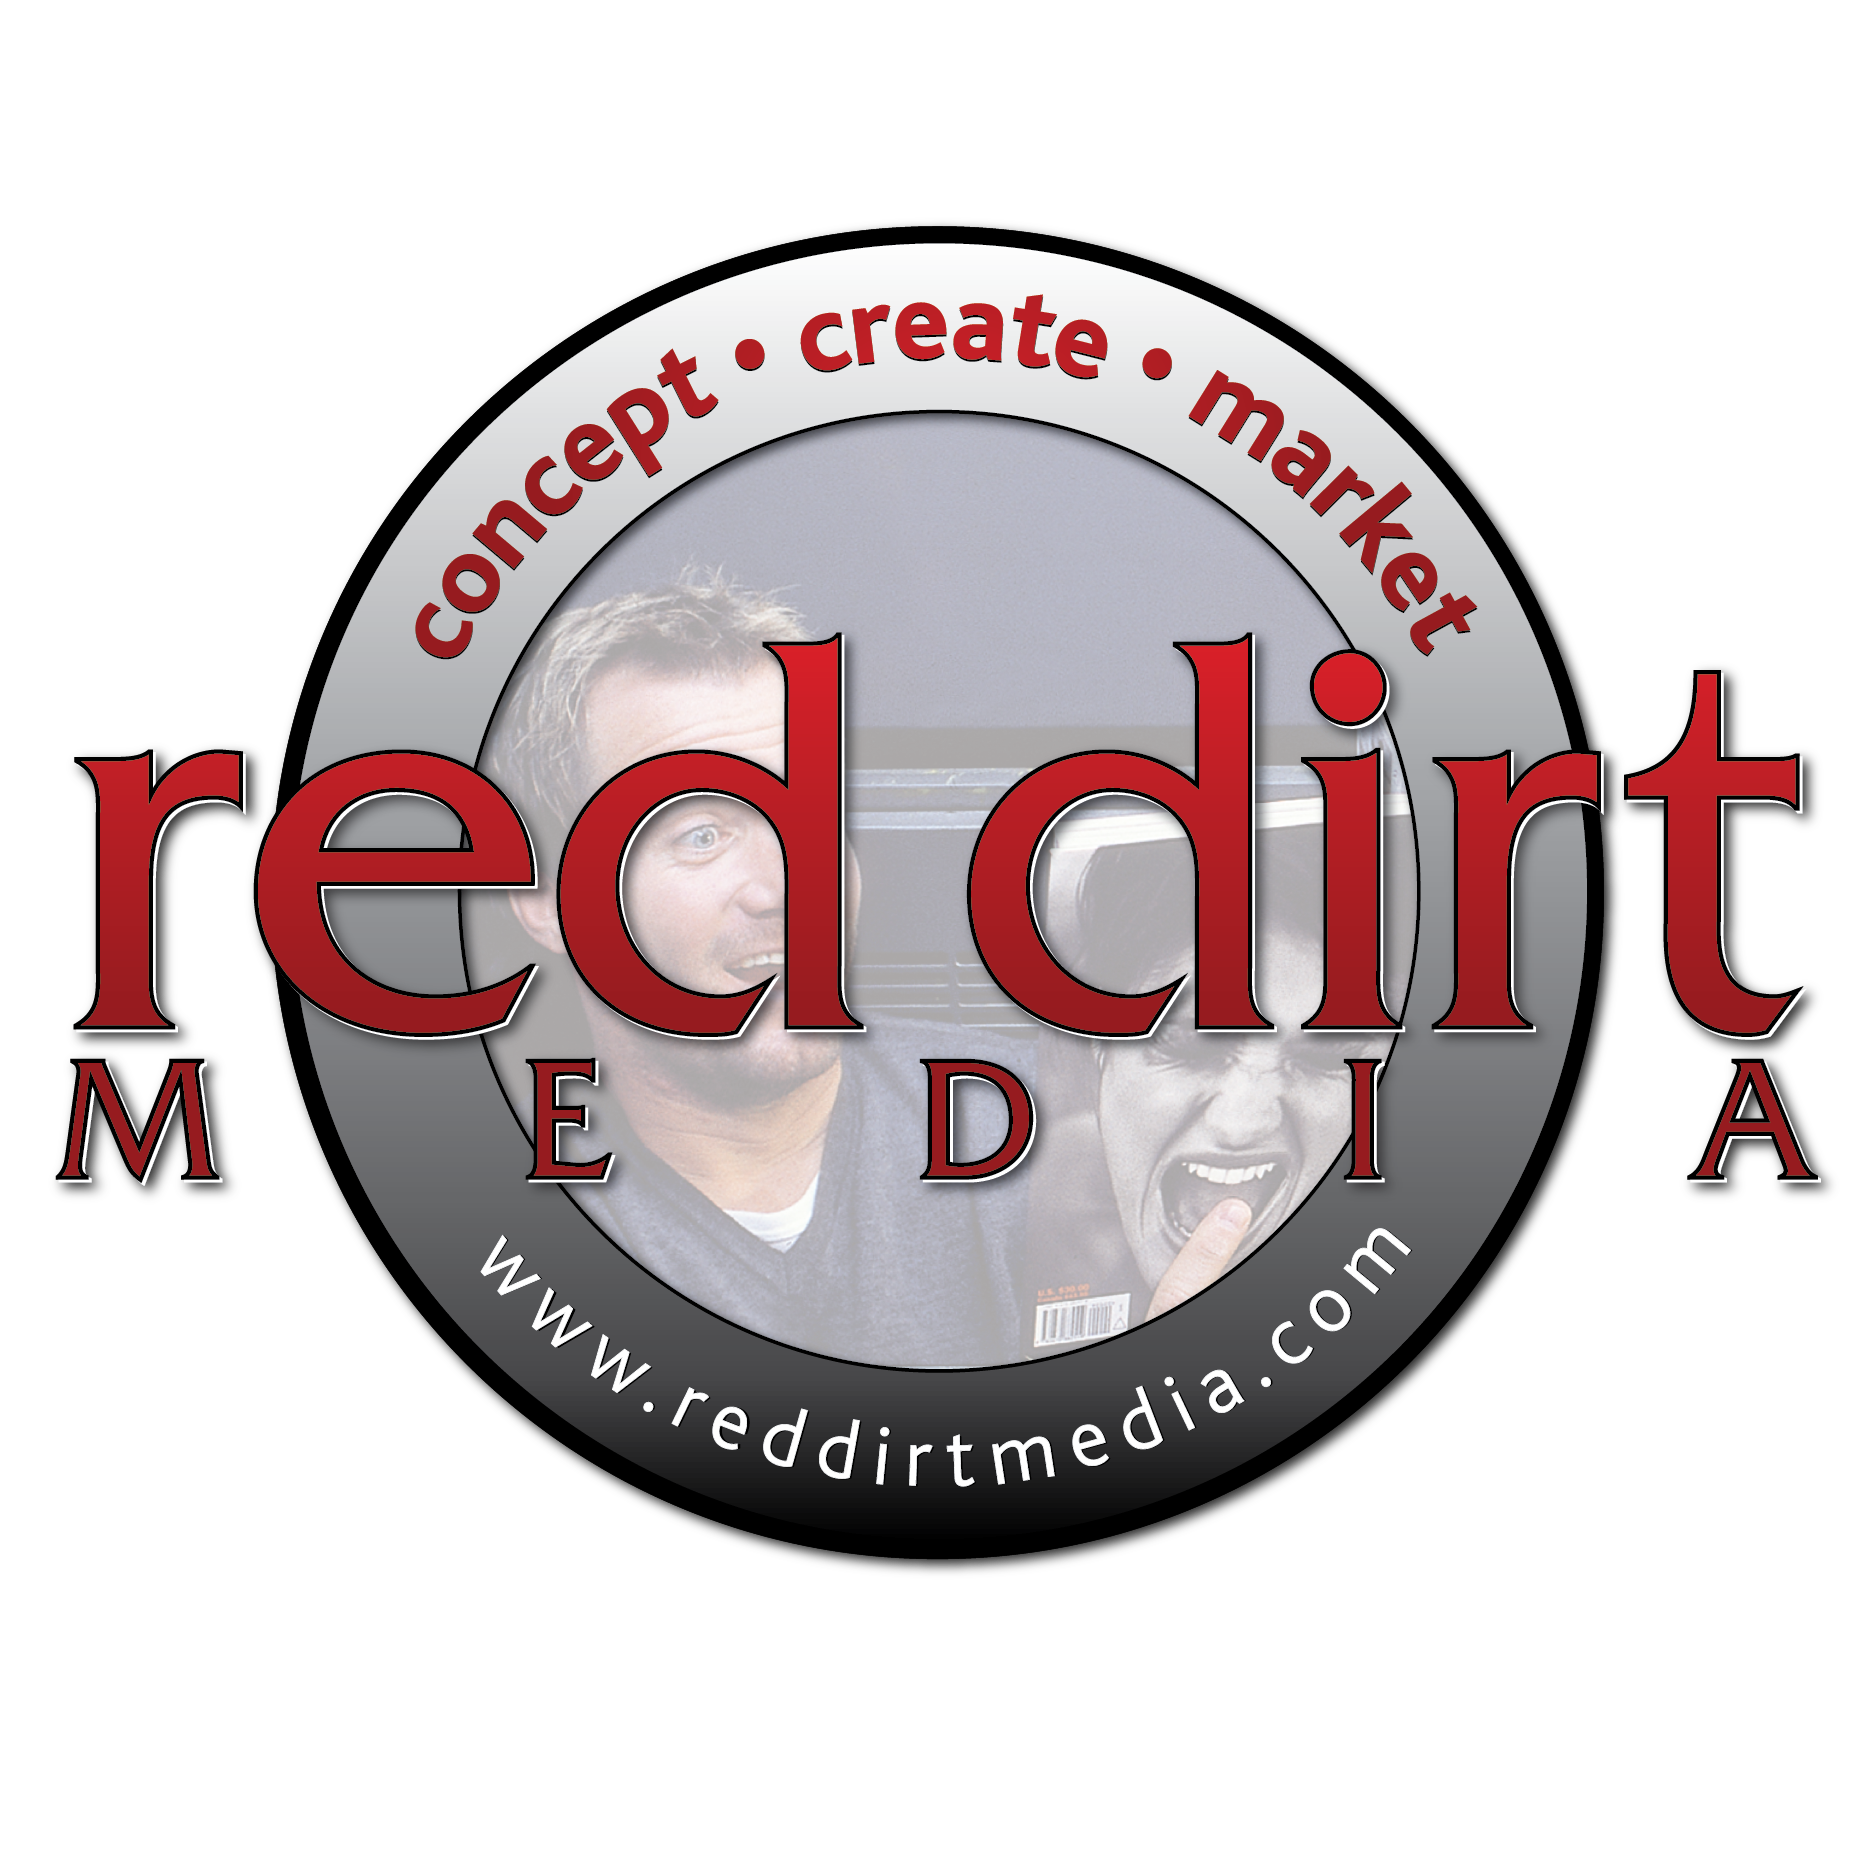 Red Dirt Media